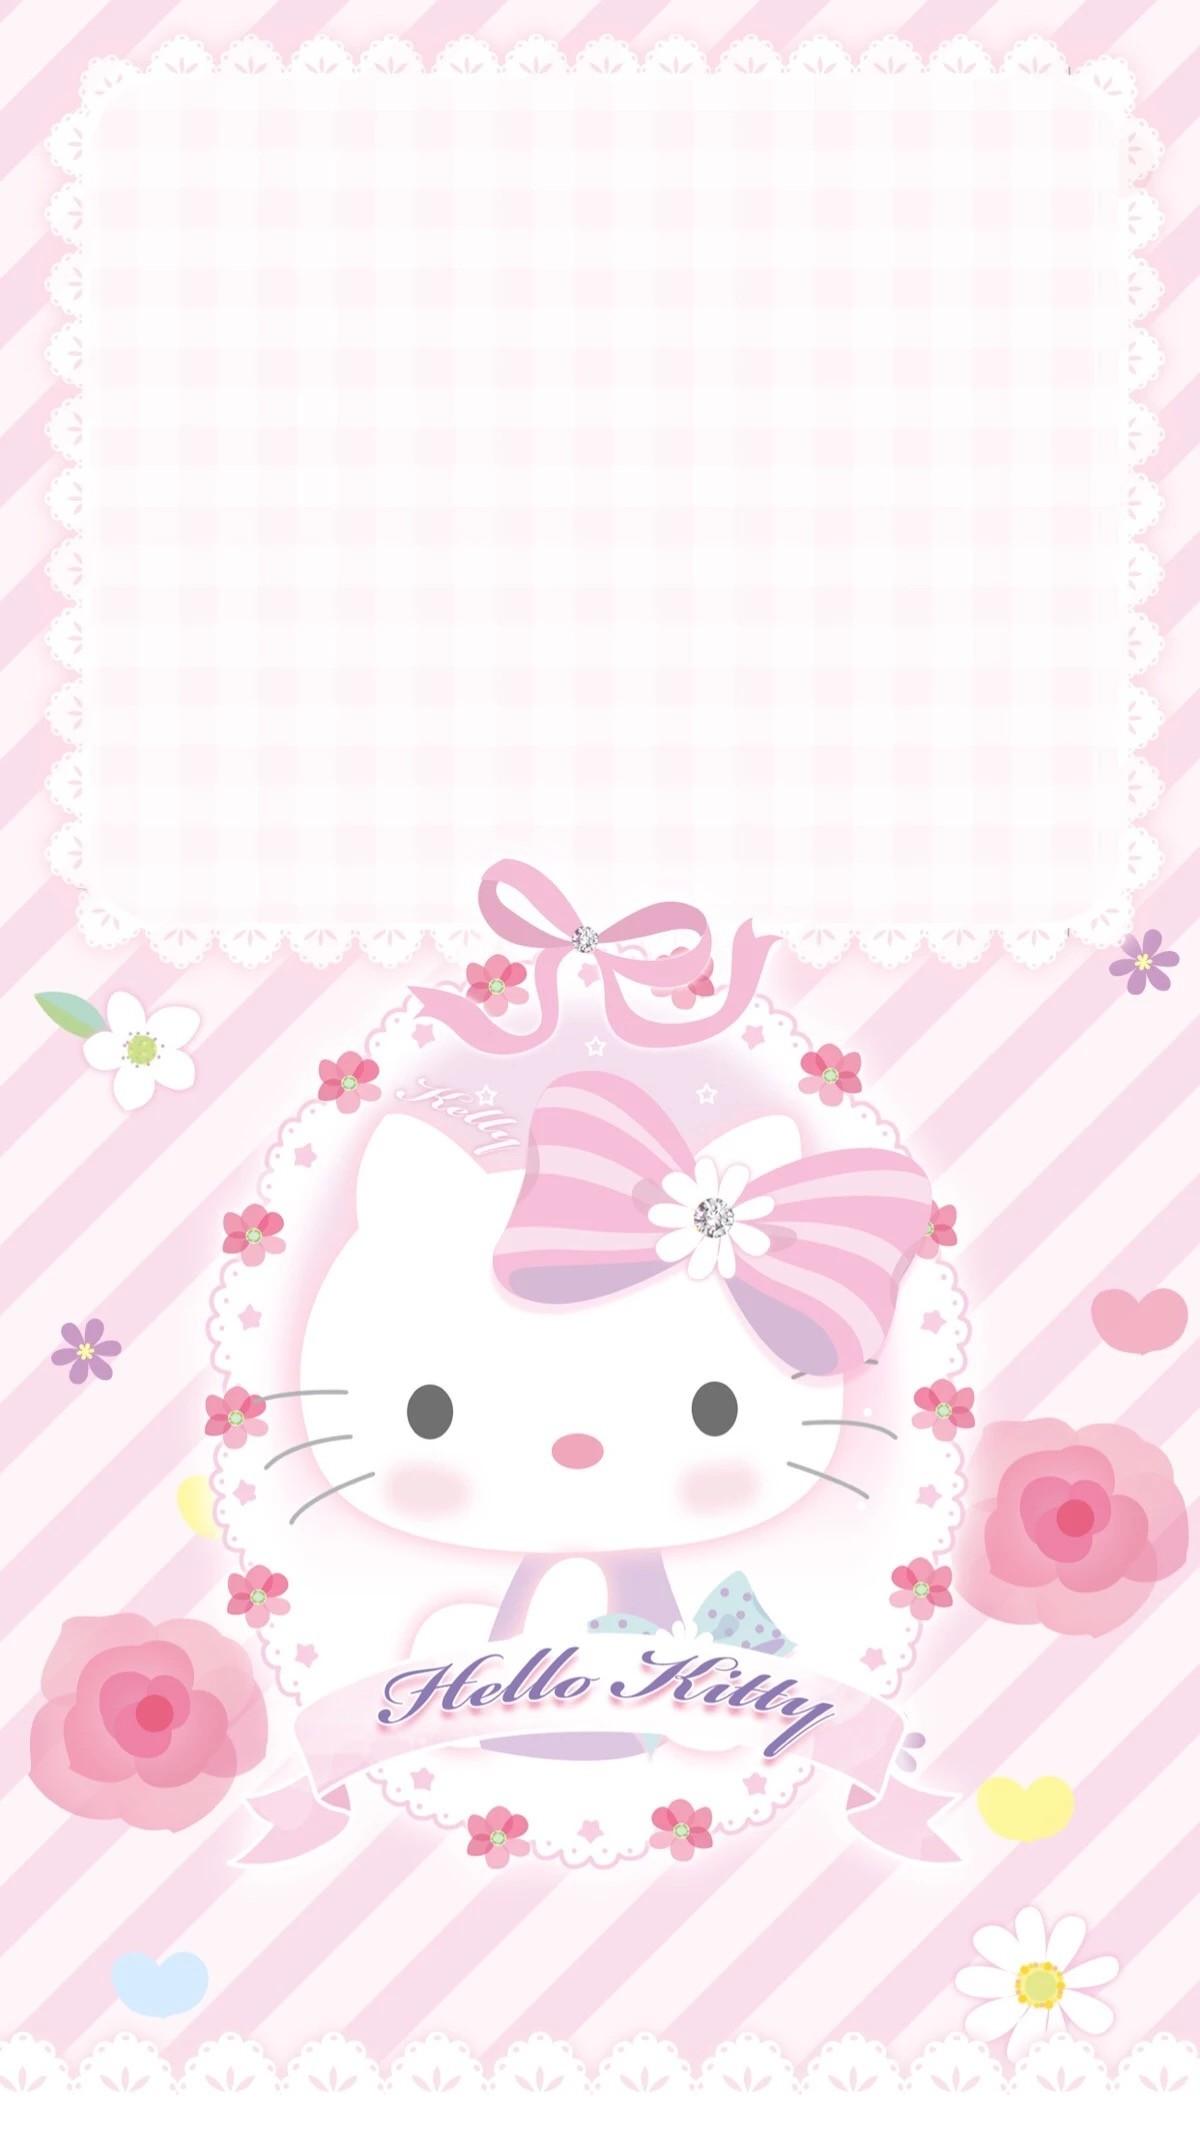 Fantastic Wallpaper Hello Kitty Pastel - 875805-hello-kitty-winter-wallpaper-1200x2133-for-desktop  Perfect Image Reference_73496.jpg